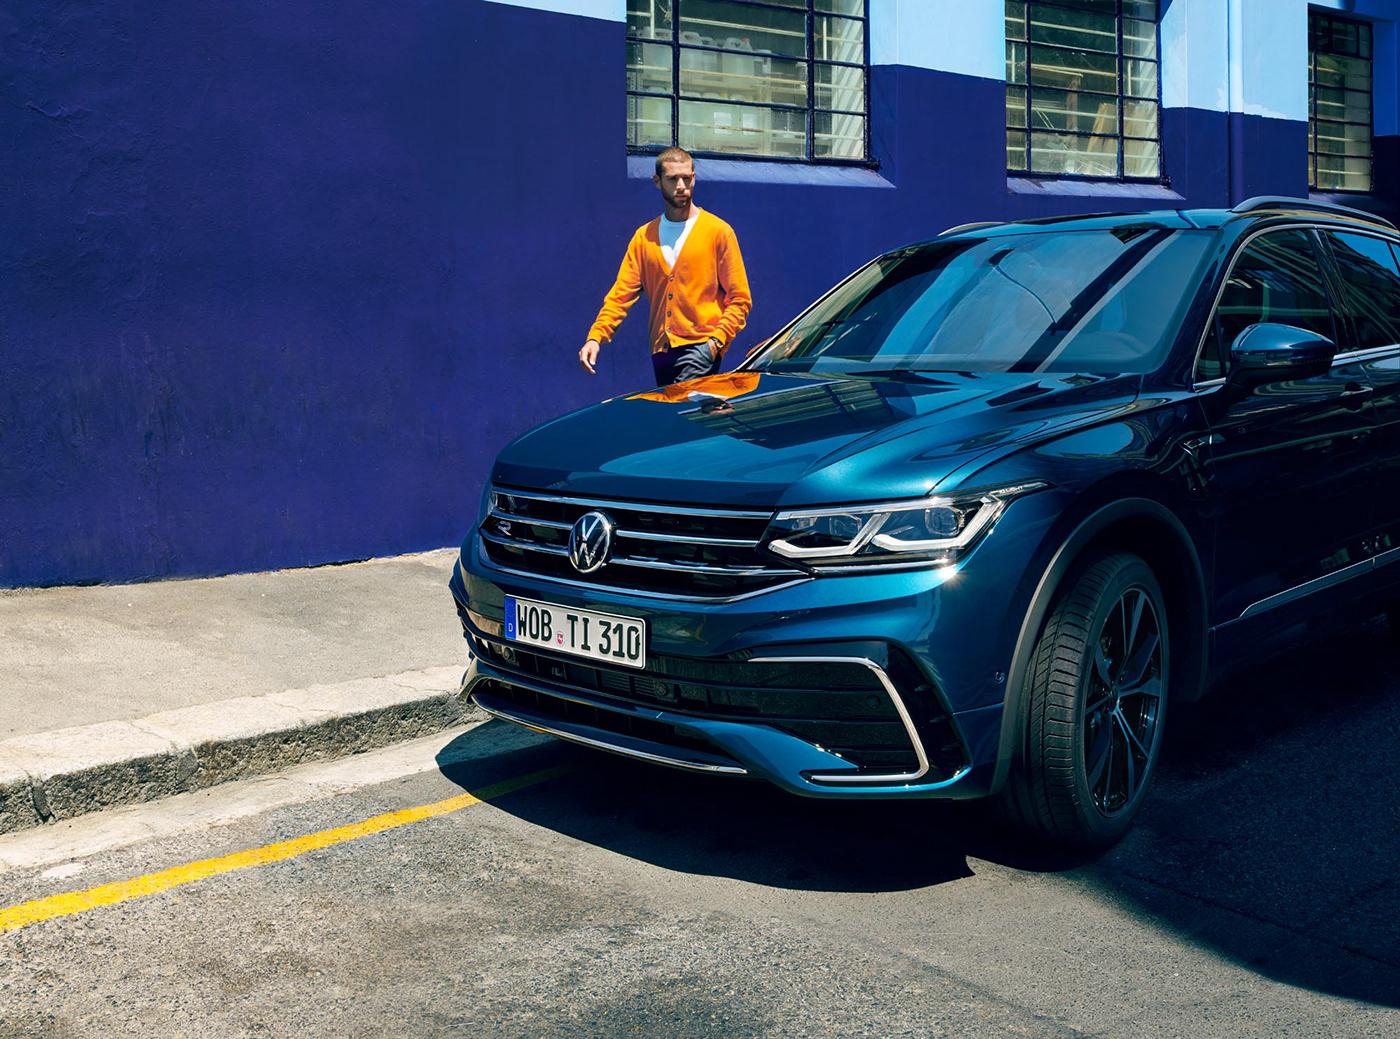 Cars G&P grabarz transportation uwe duettmann volkswagen VW